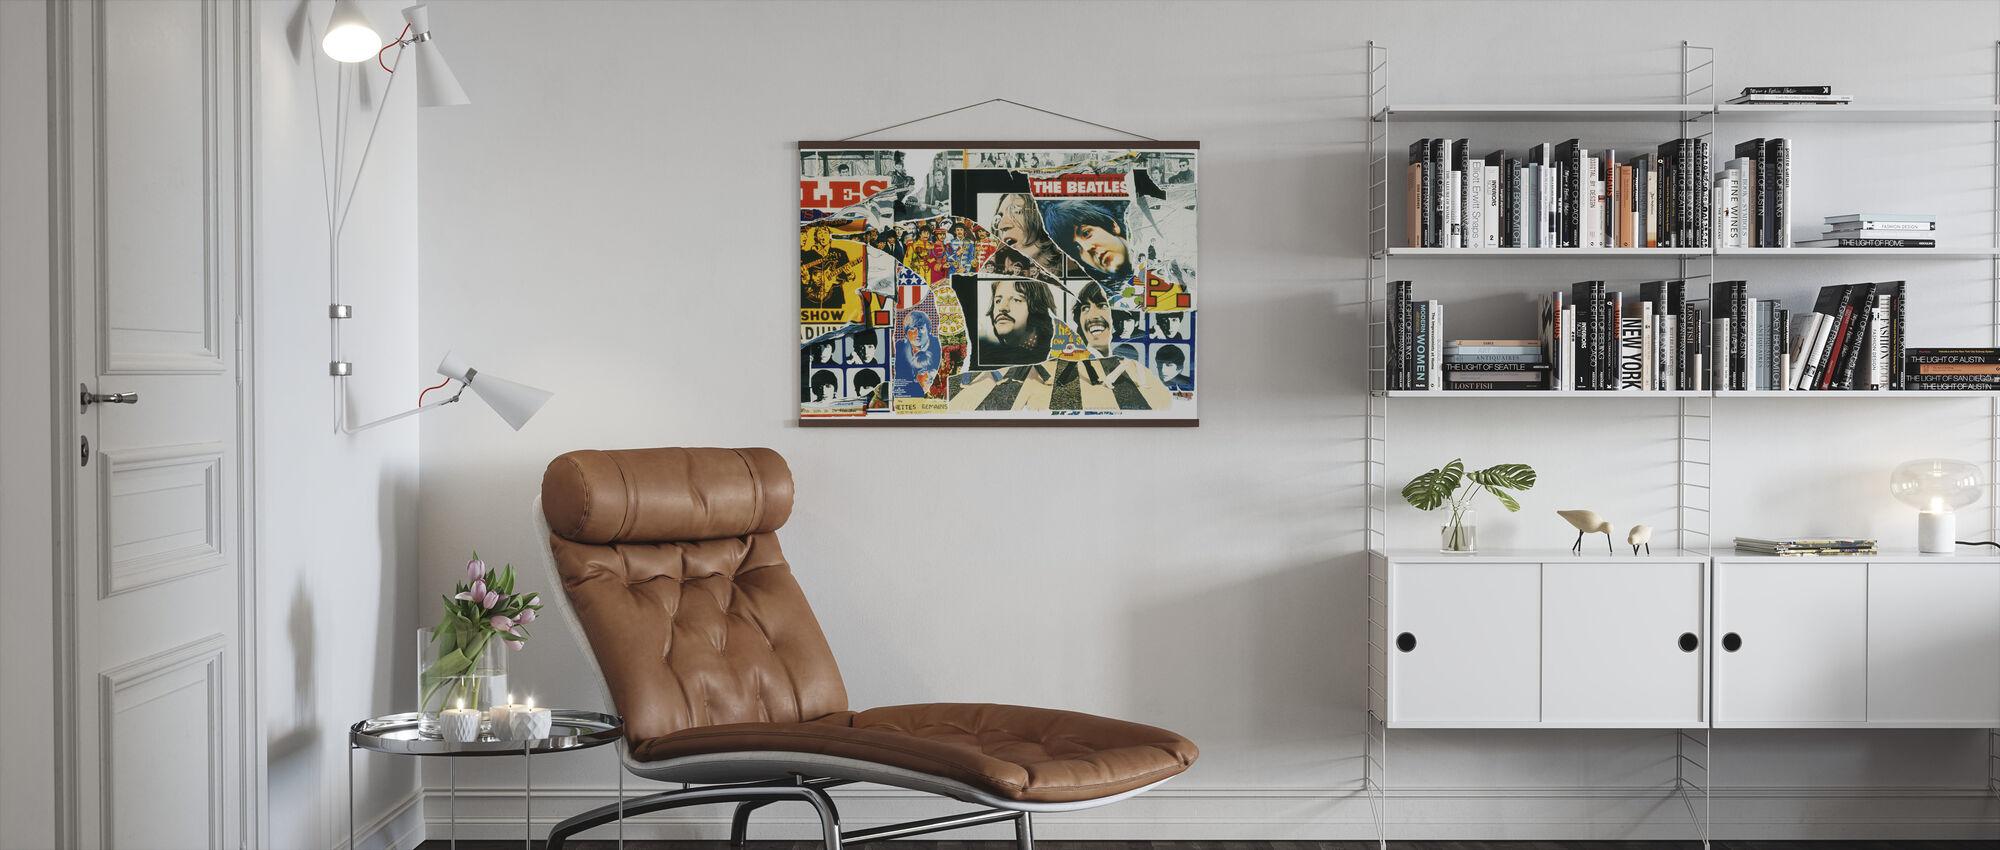 Beatles - Vintage plakat vegg - Plakat - Stue